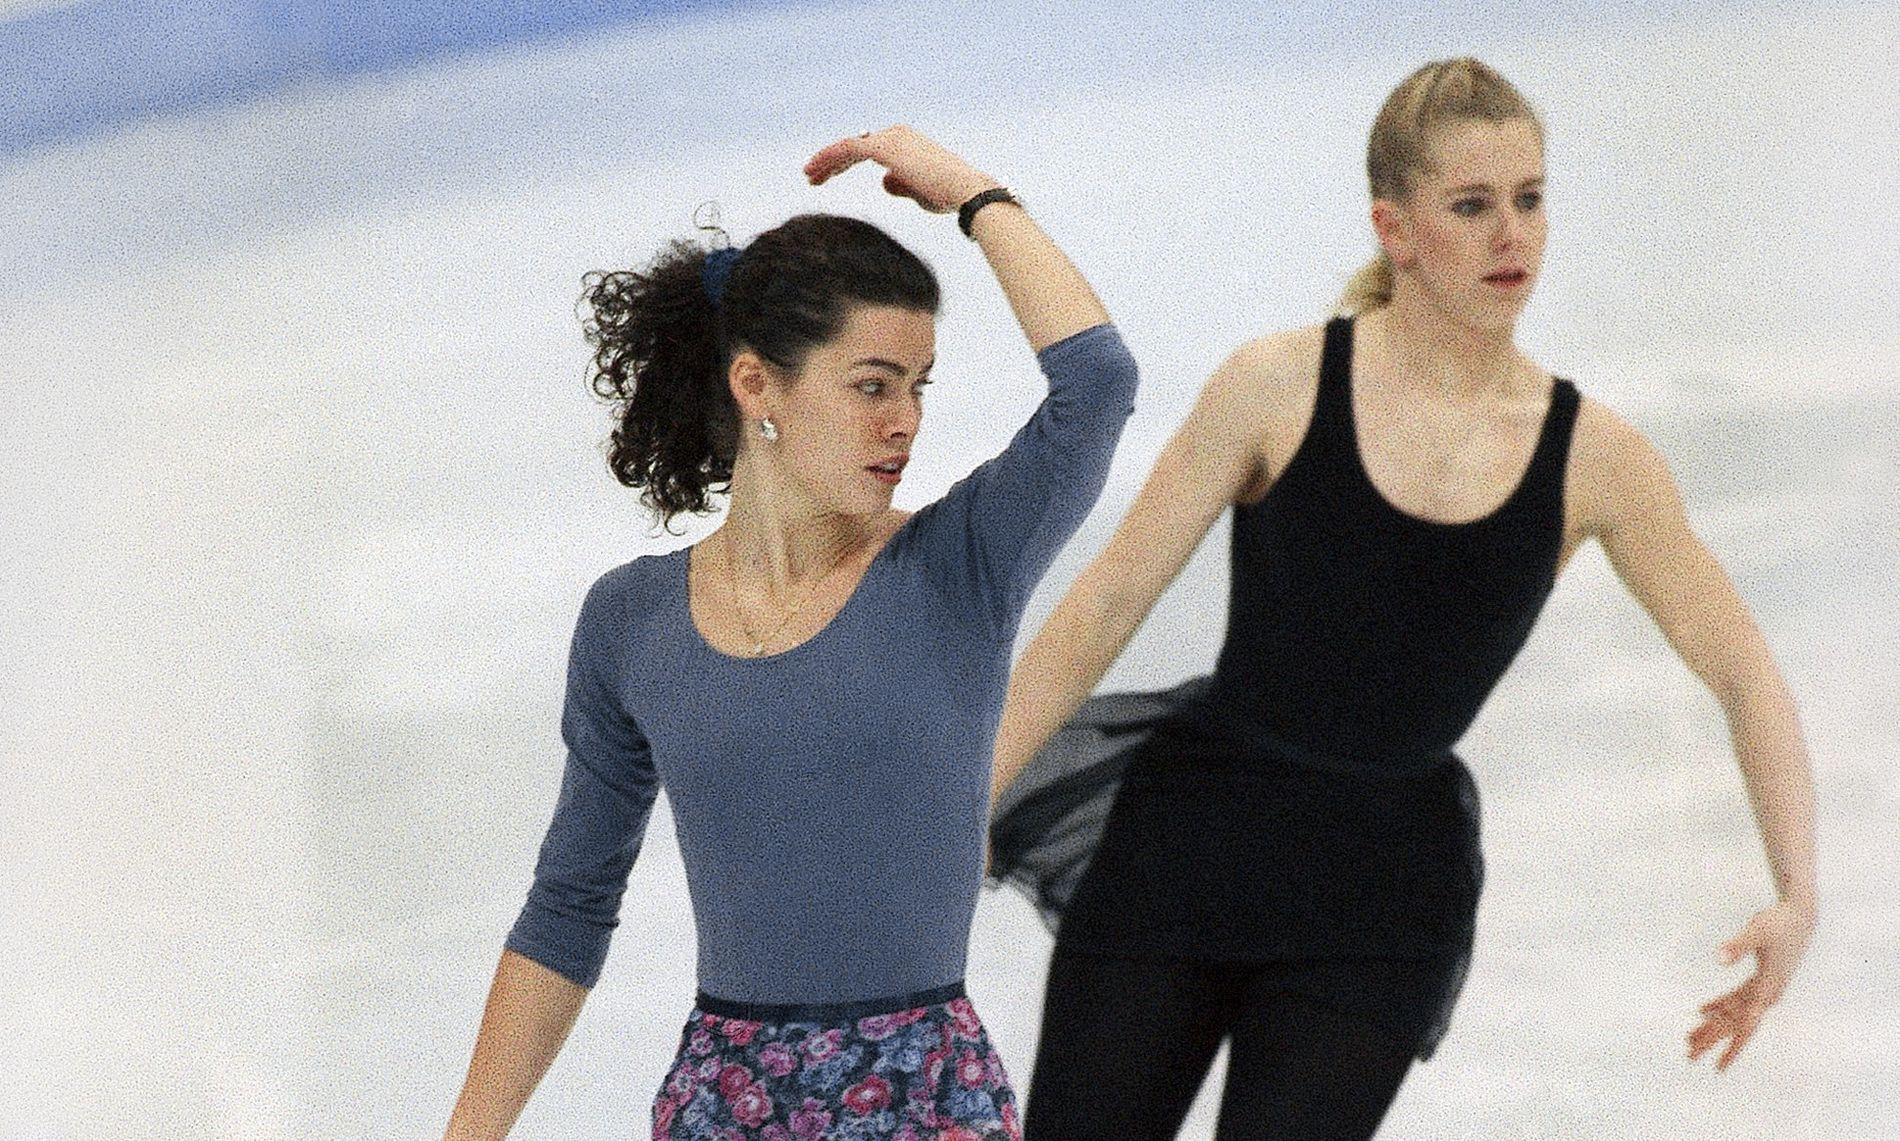 ISKALDT: Nancy Kerrigan (t.v.) og Tonya Harding vekslet ikke et ord på Hamar under OL i 1994. Her trener de i Storhamarhallen.